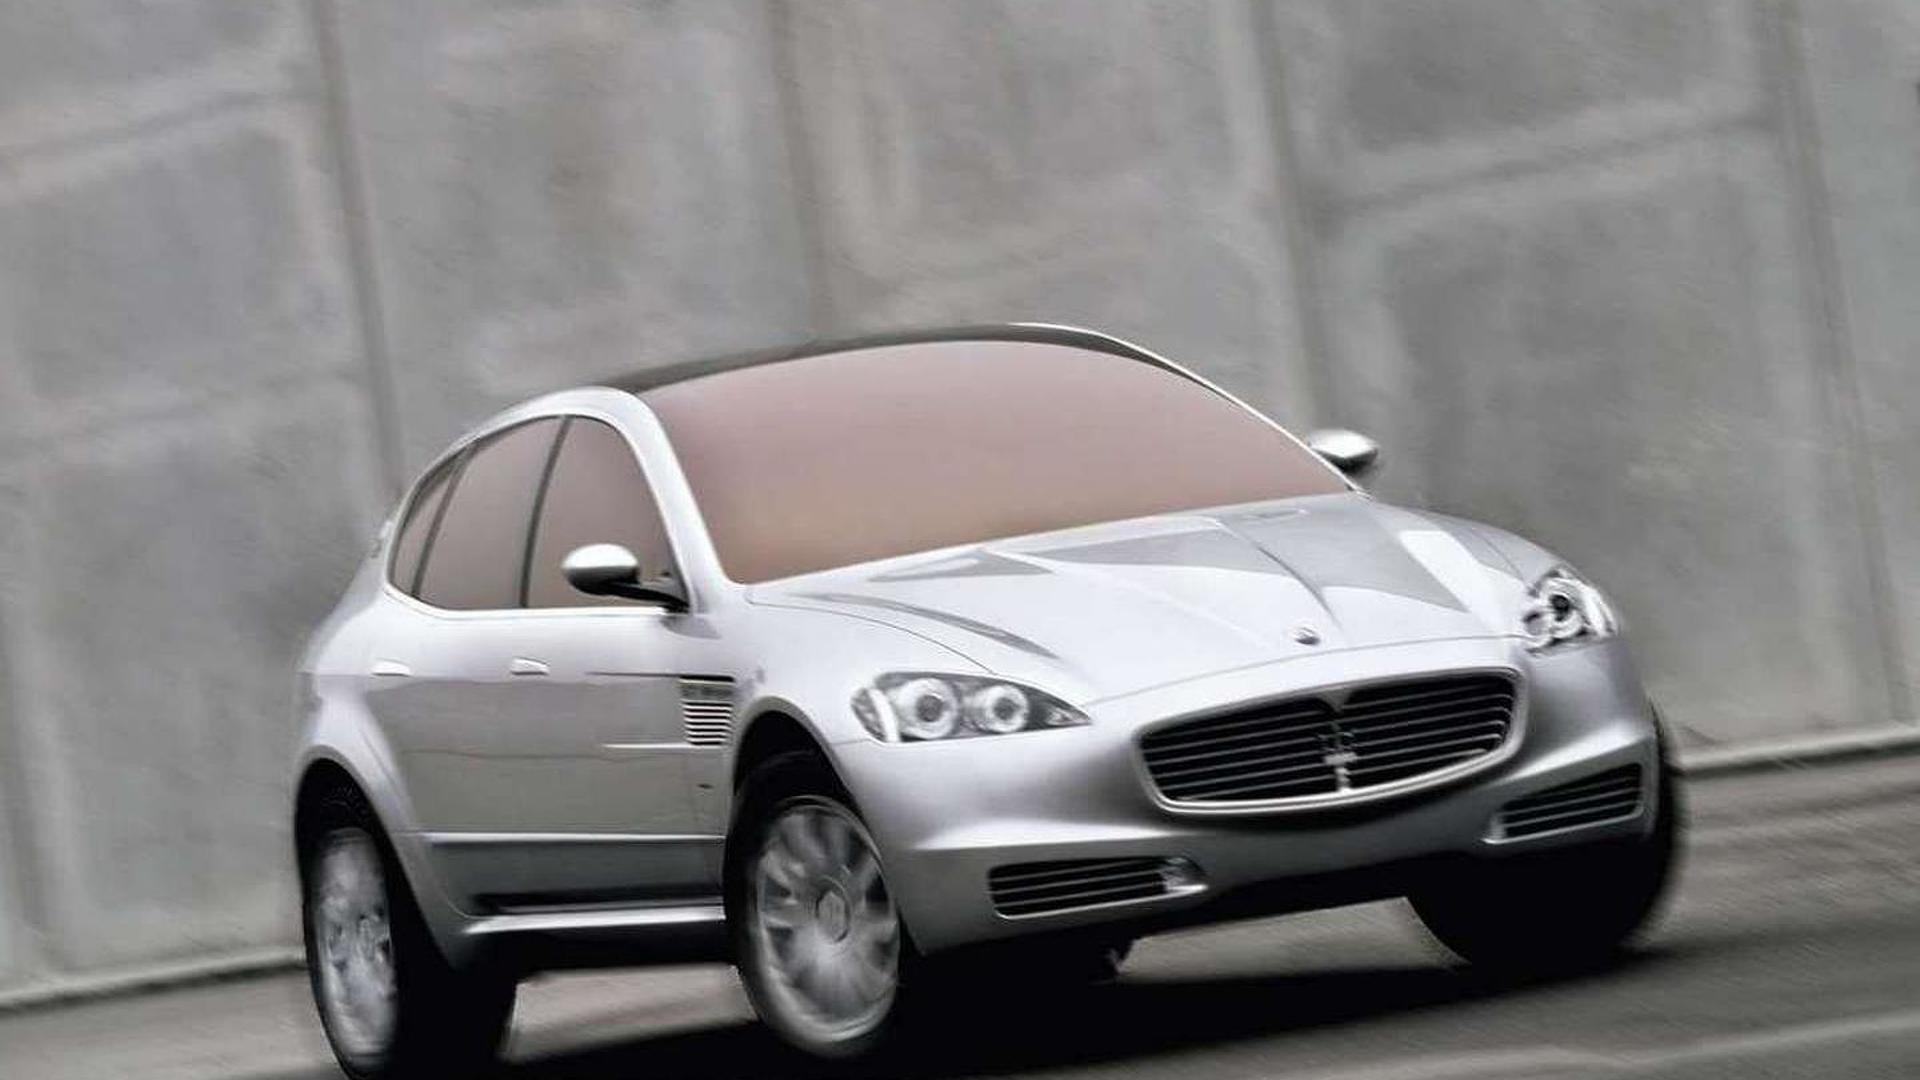 Maserati SUV will be 'Made in Detroit'